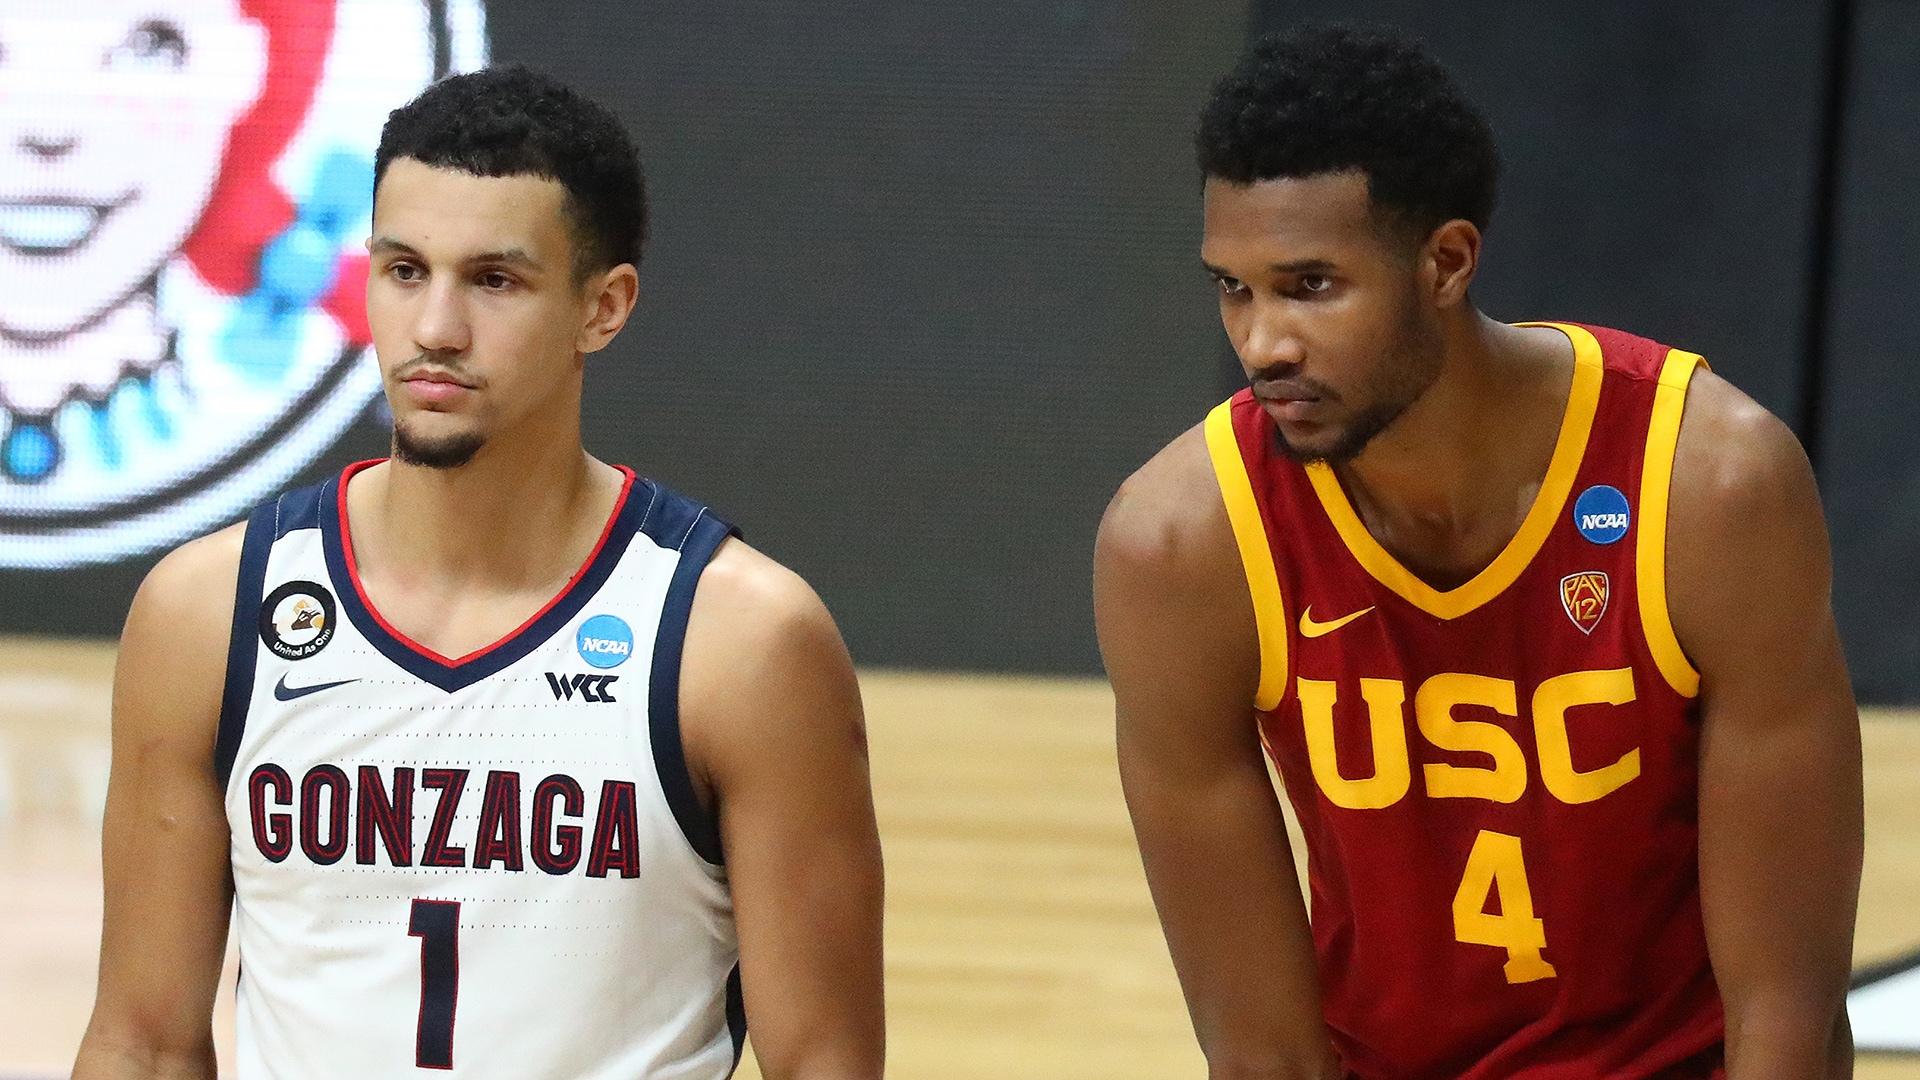 2021 NBA Draft: Breaking down the prospects